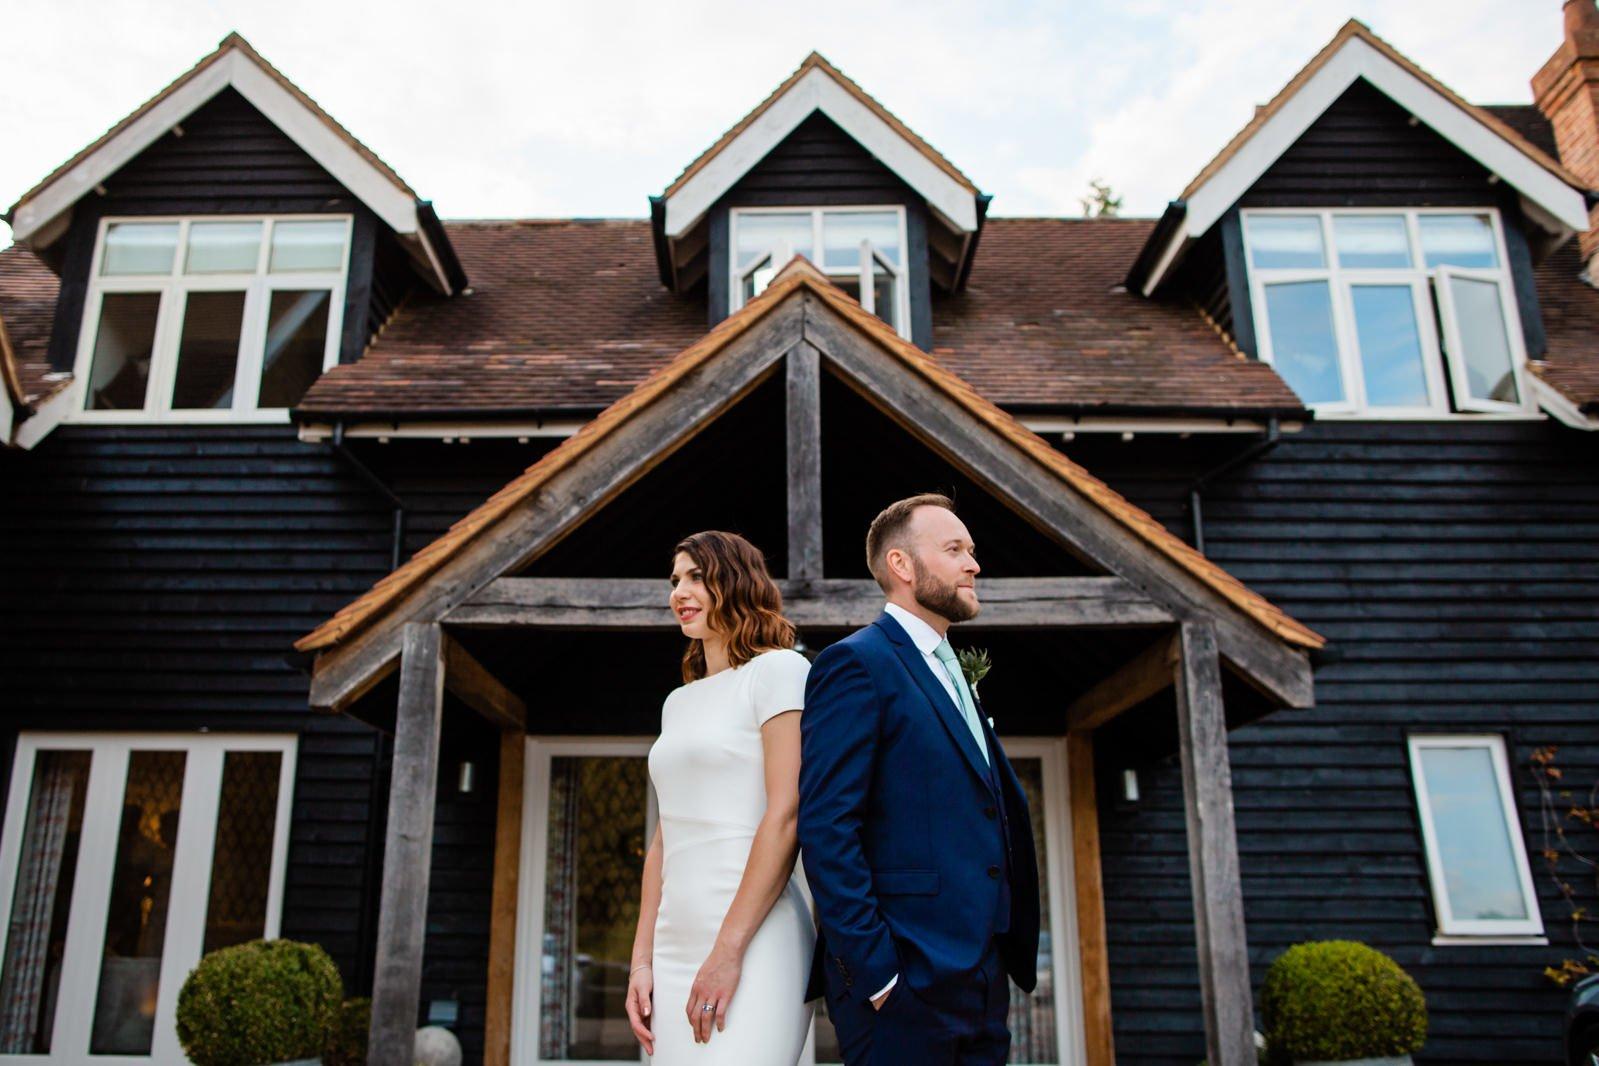 best wedding photos of 2019 40